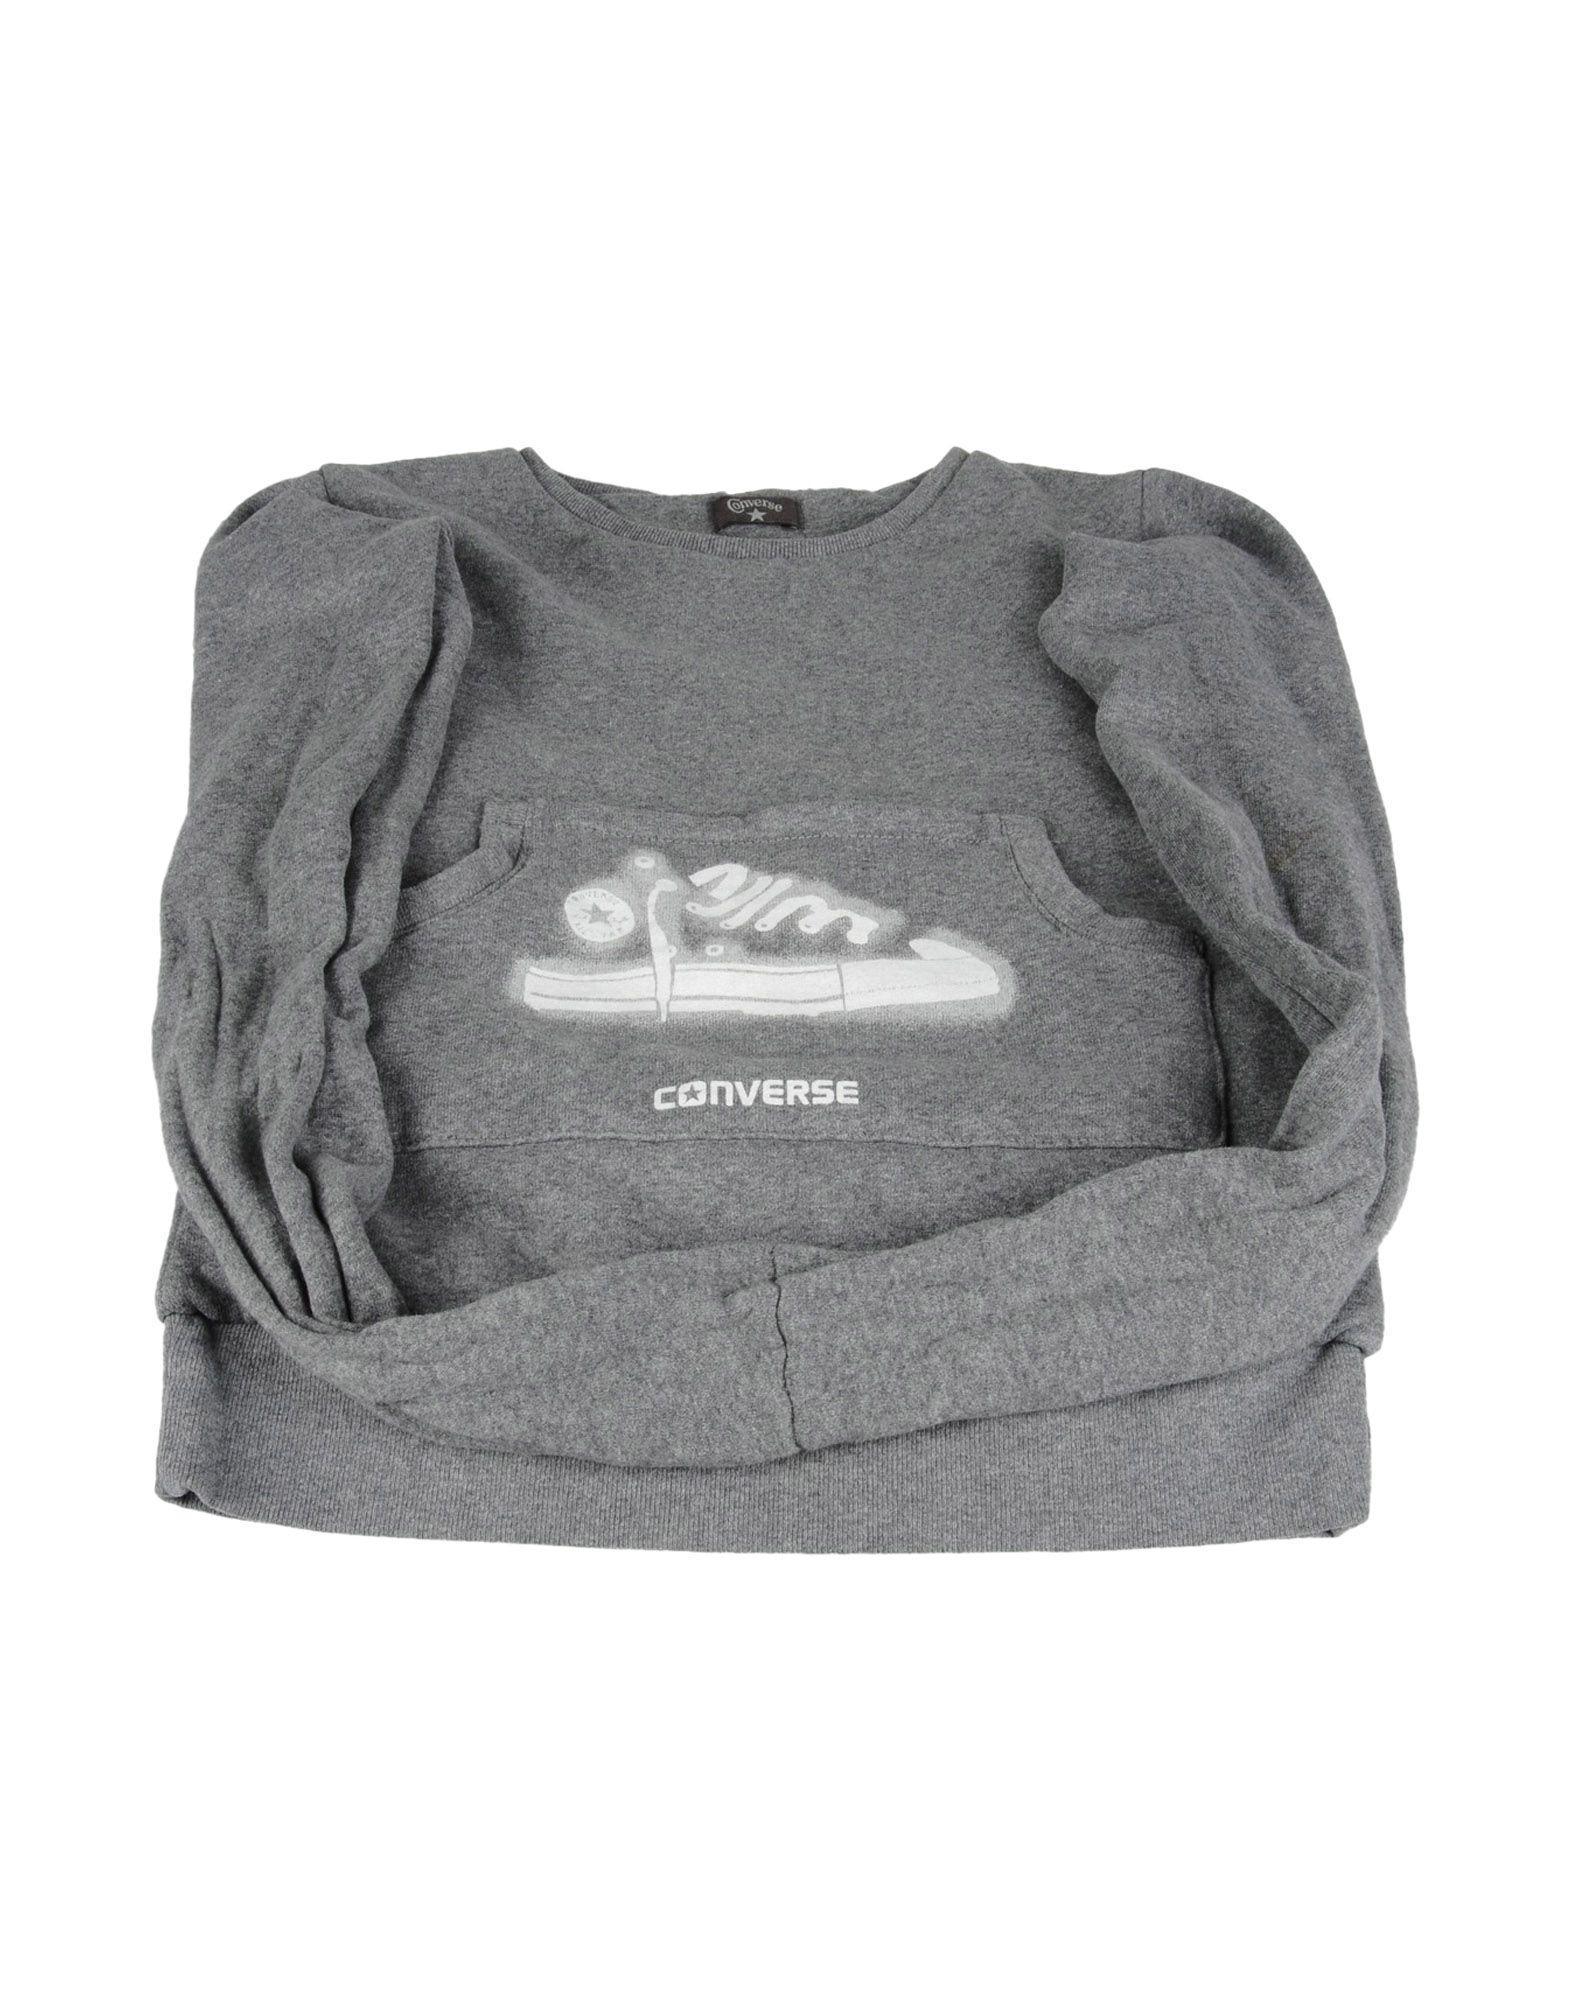 Converse Fleece Cross-body Bag in Grey (Grey)